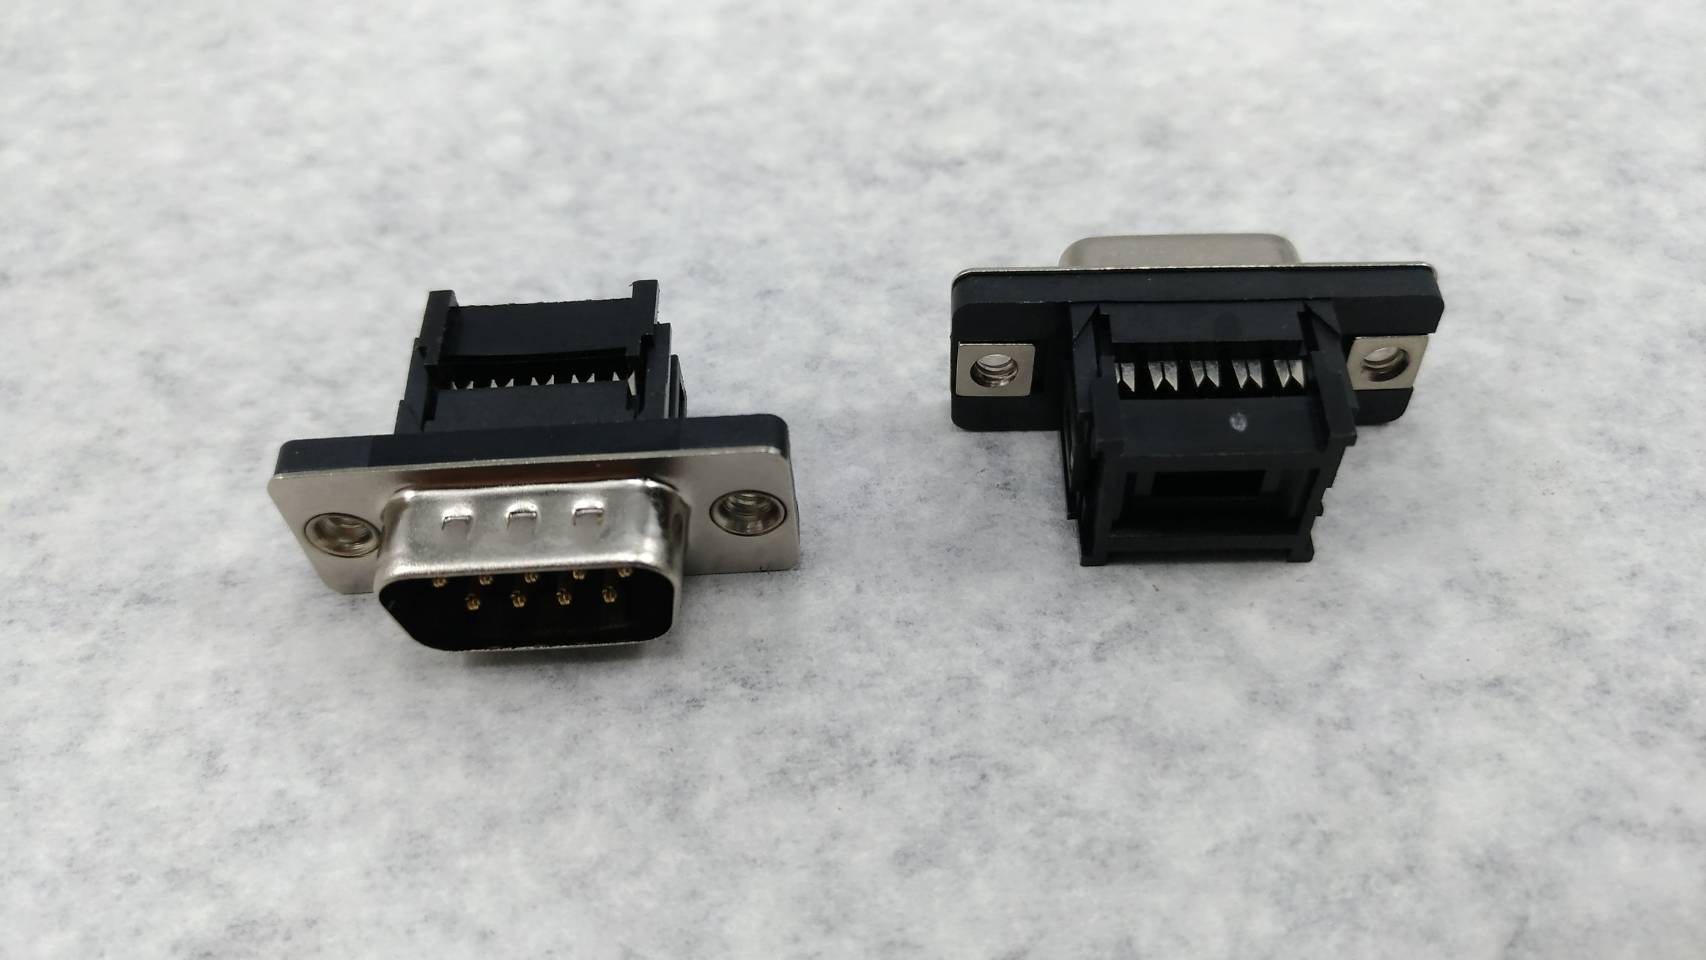 D-SUB IDC connector